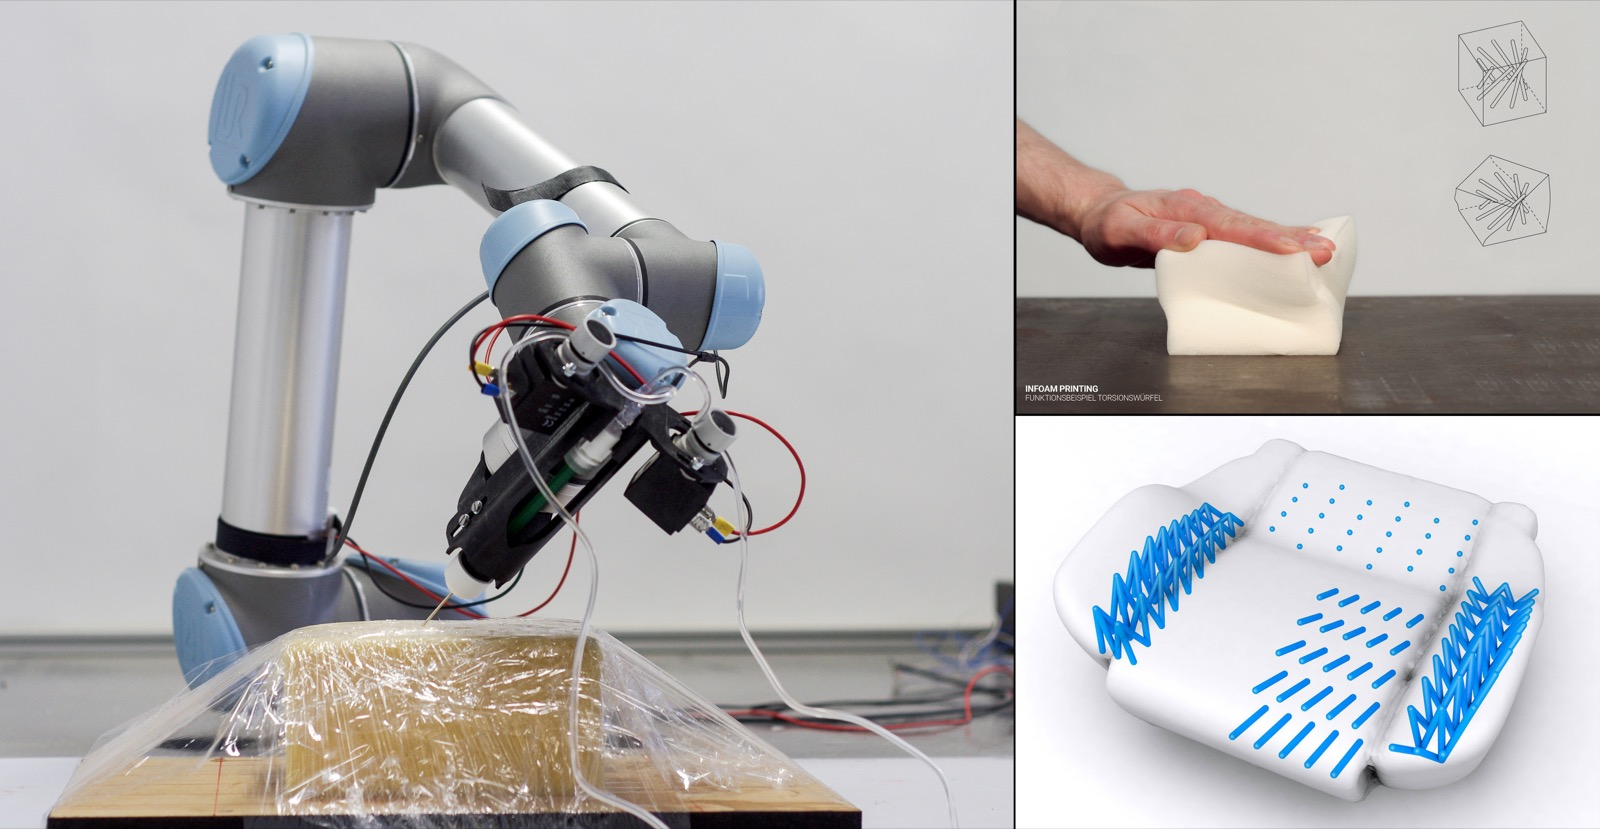 InFoam Printing – 3D printing smart foam elements